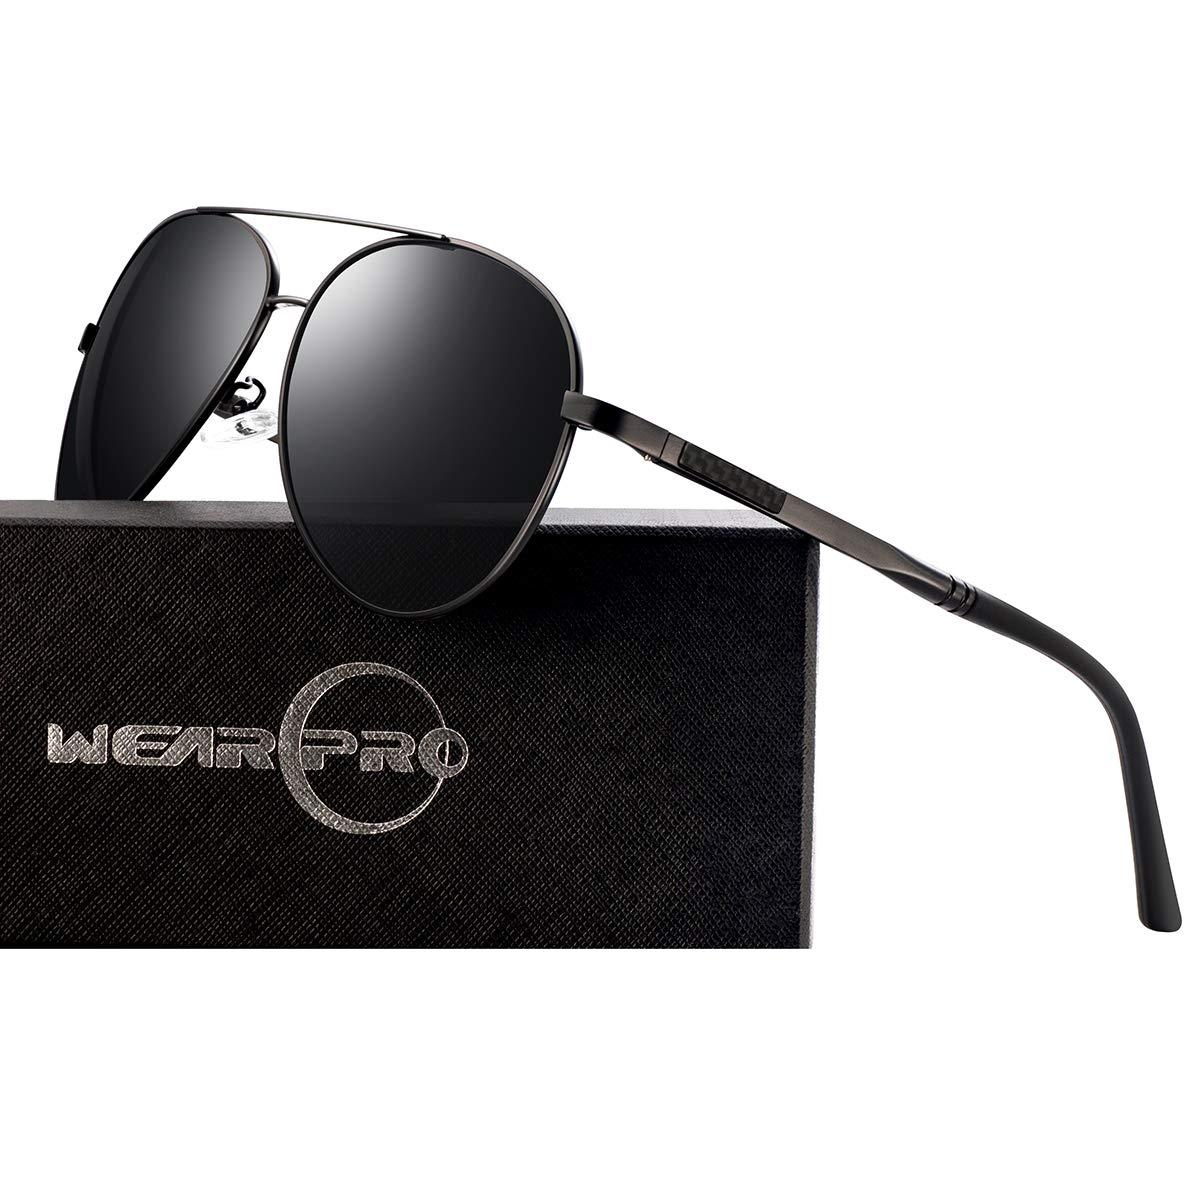 6dbf15715a Aviator Sunglasses for Men Polarized Premium Military Style Classic Fashion  Metal Glasses 100% UV400 Ultraviolet